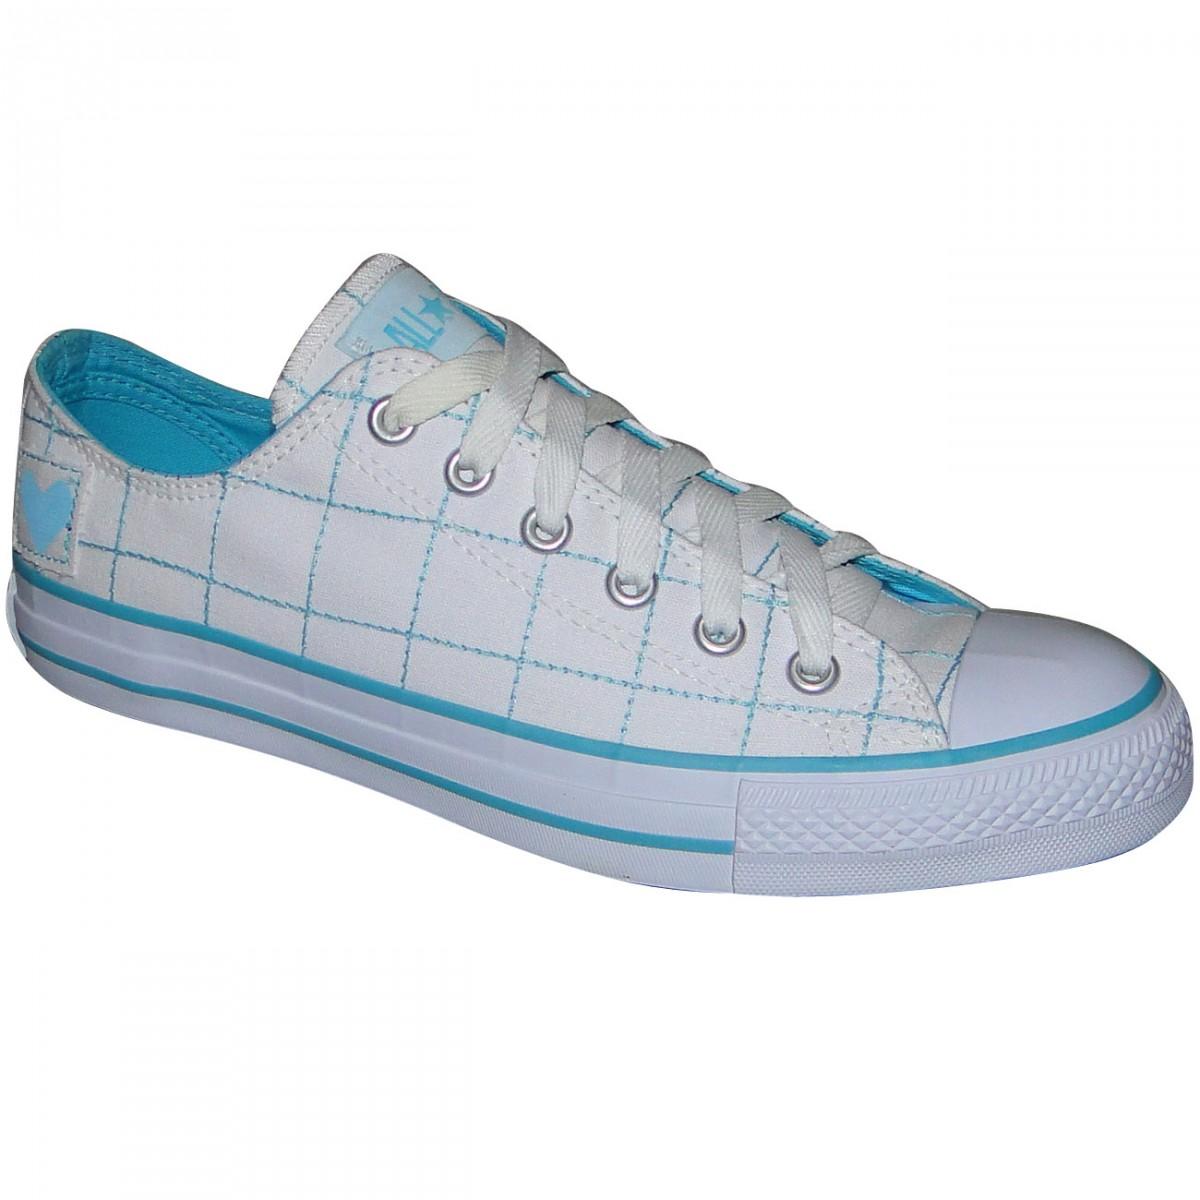 ad9d2989371 Tênis All Star Converse Specialty Ox 1621 - BRANCO VERDE - Chuteira Nike